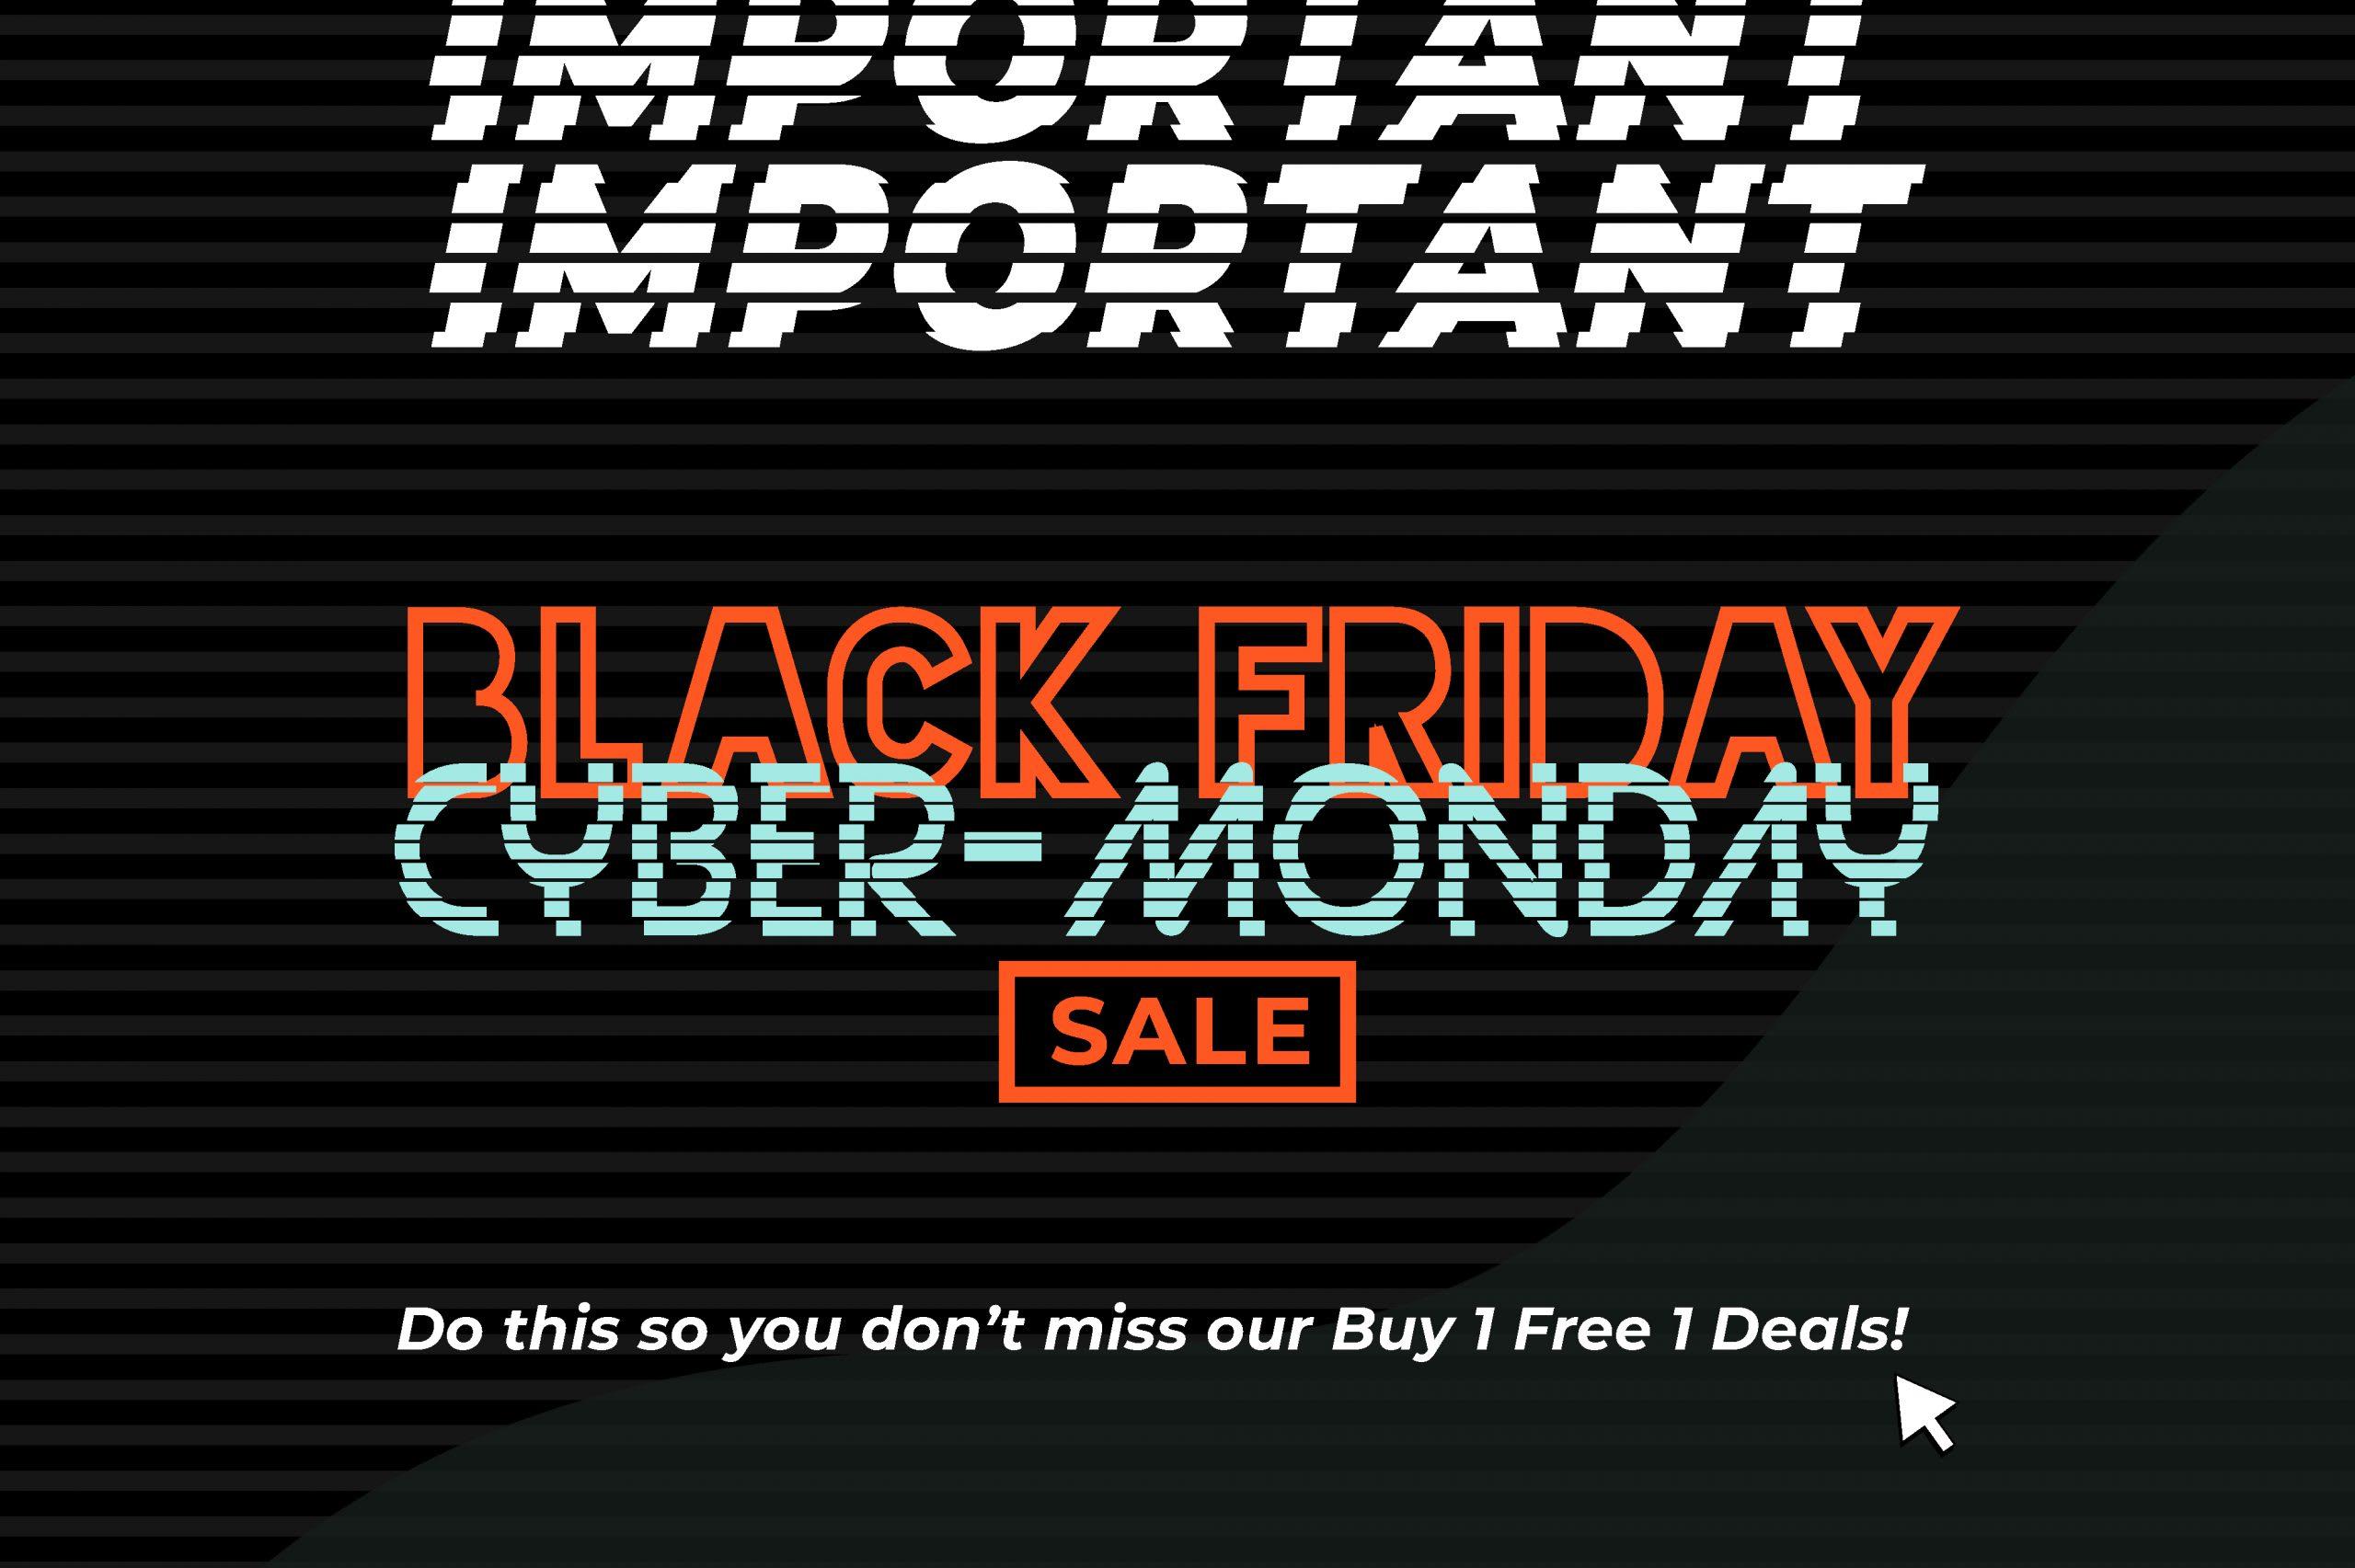 friday sale so black